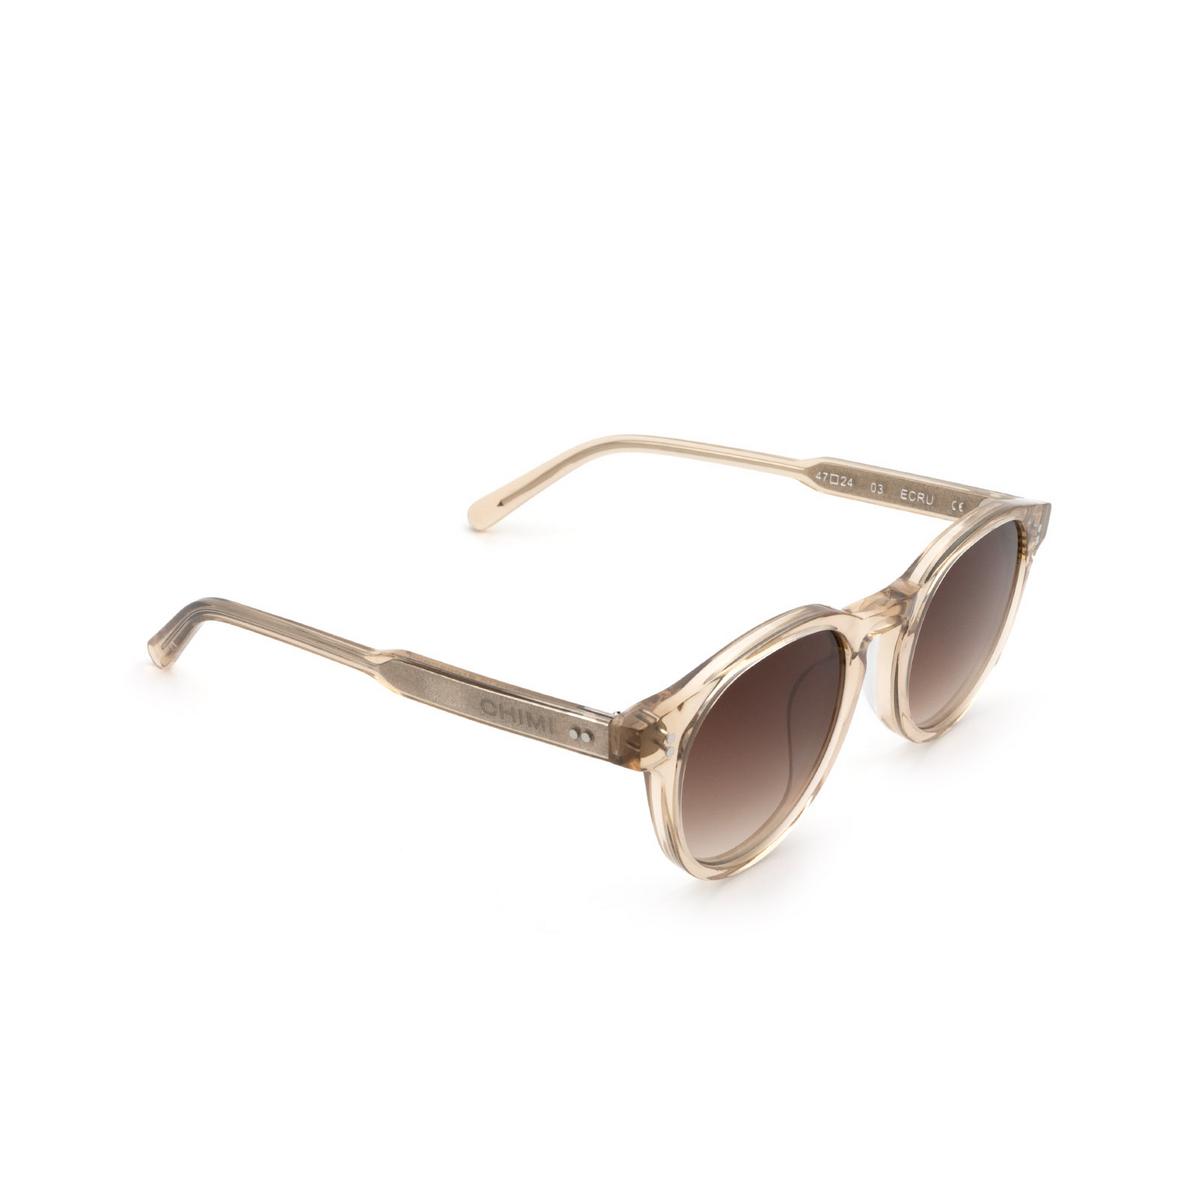 Chimi® Round Sunglasses: 03 color Ecru - three-quarters view.